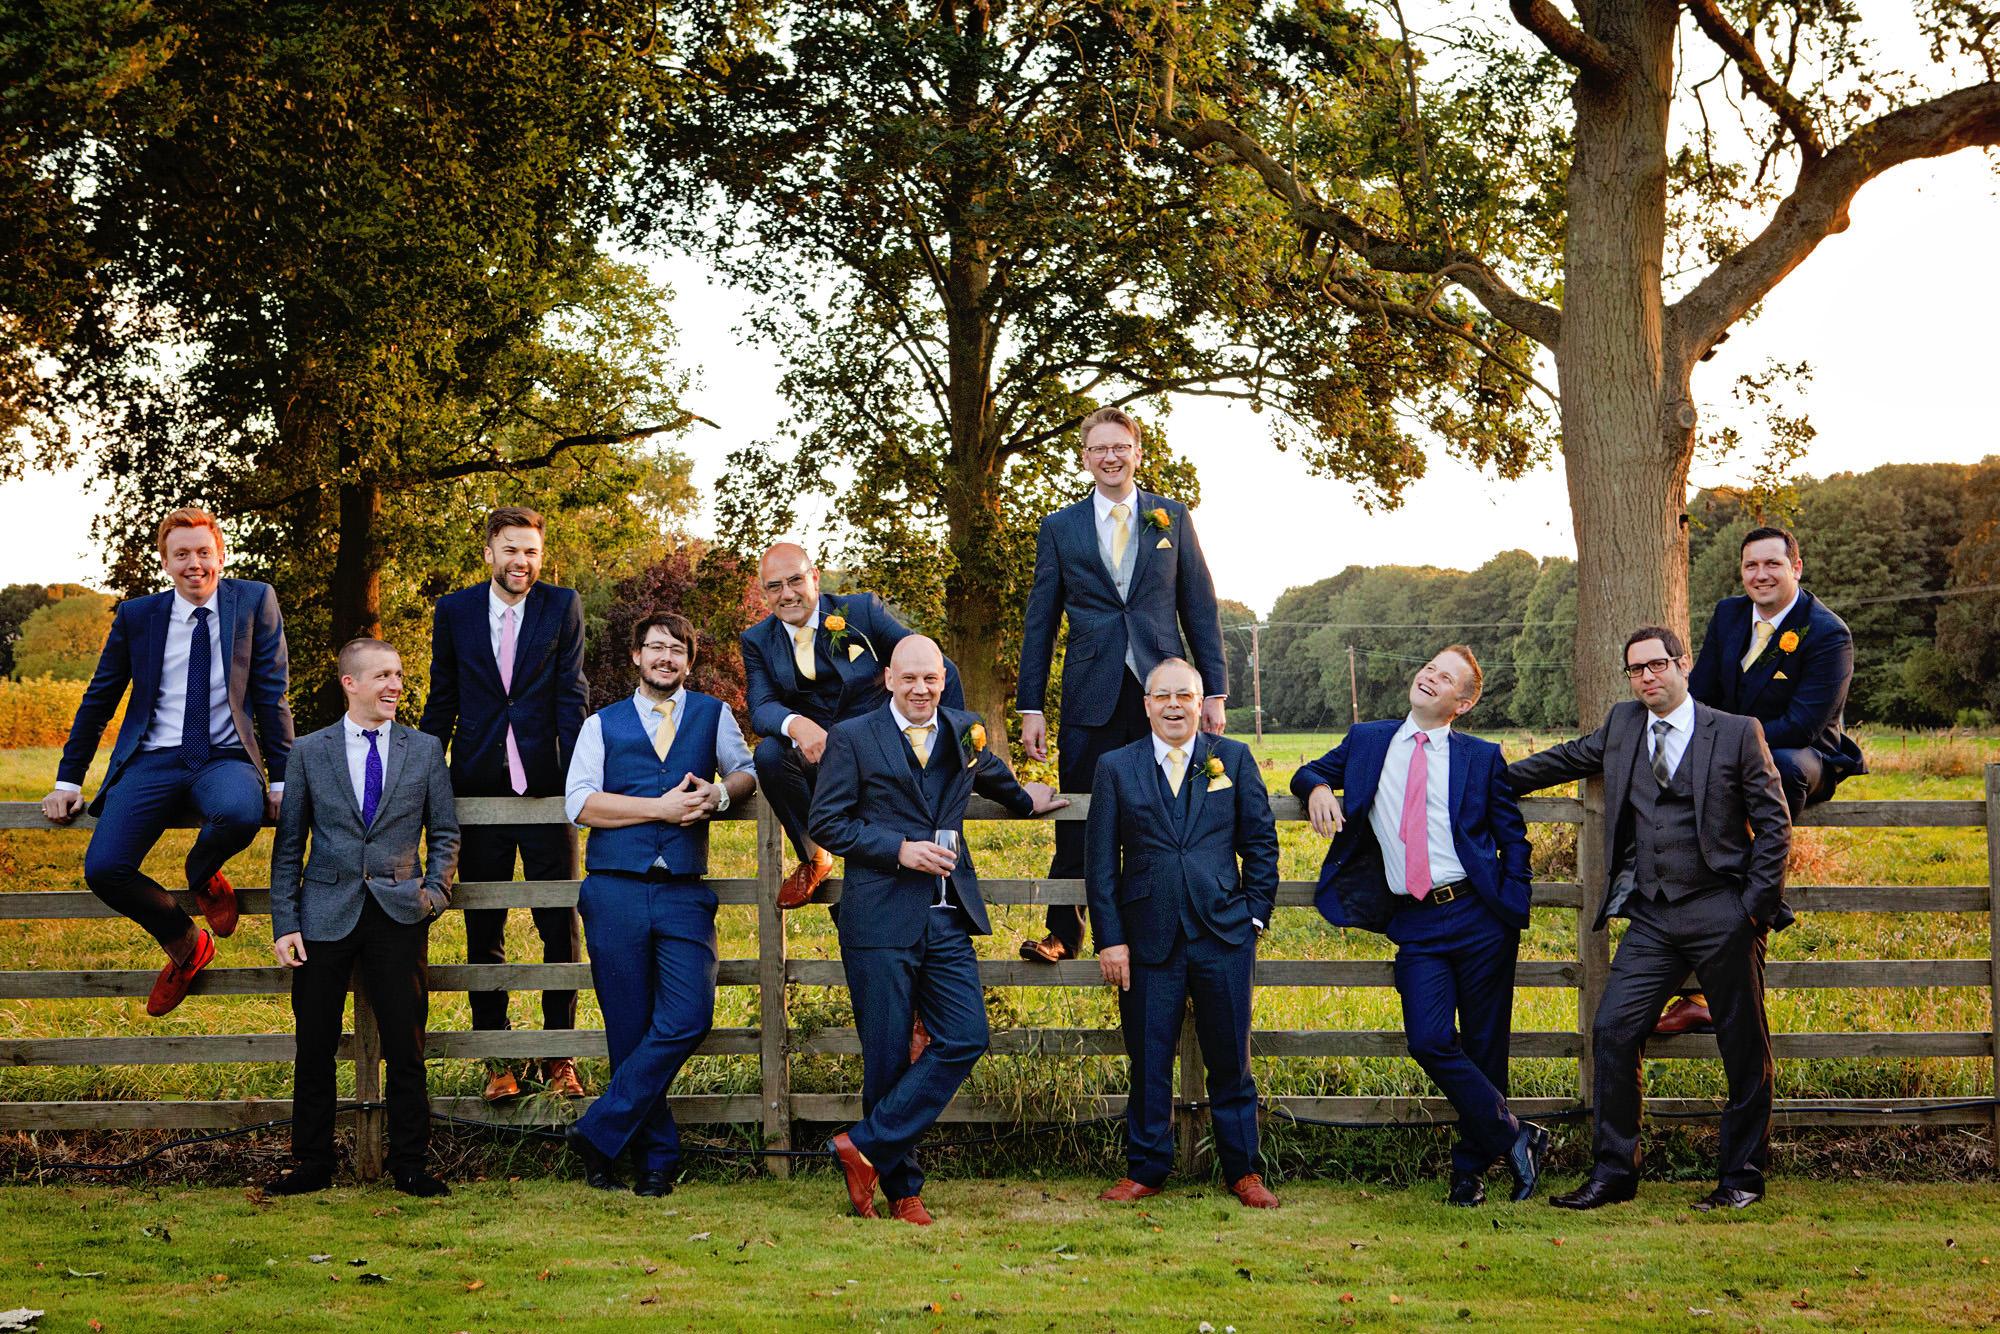 wedding at Normanton Park hotel (31).jpg